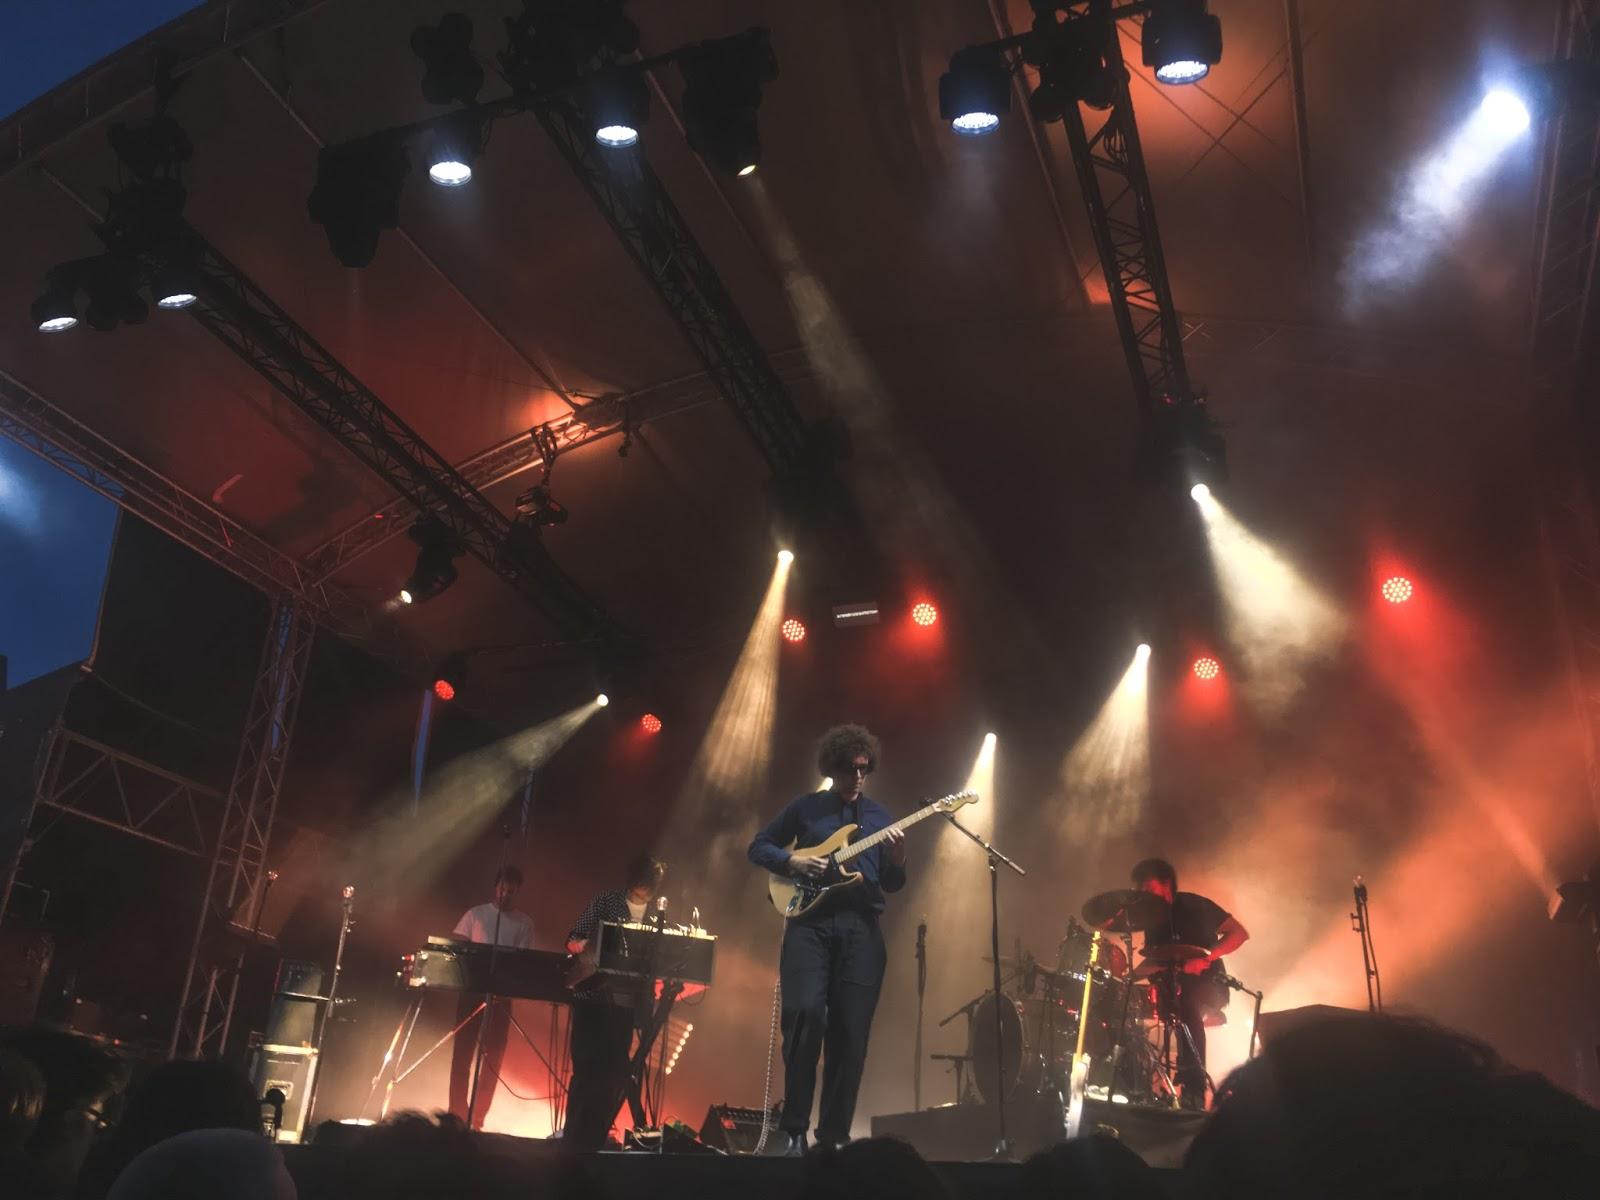 live groupe paradis festival cabourg mon amour